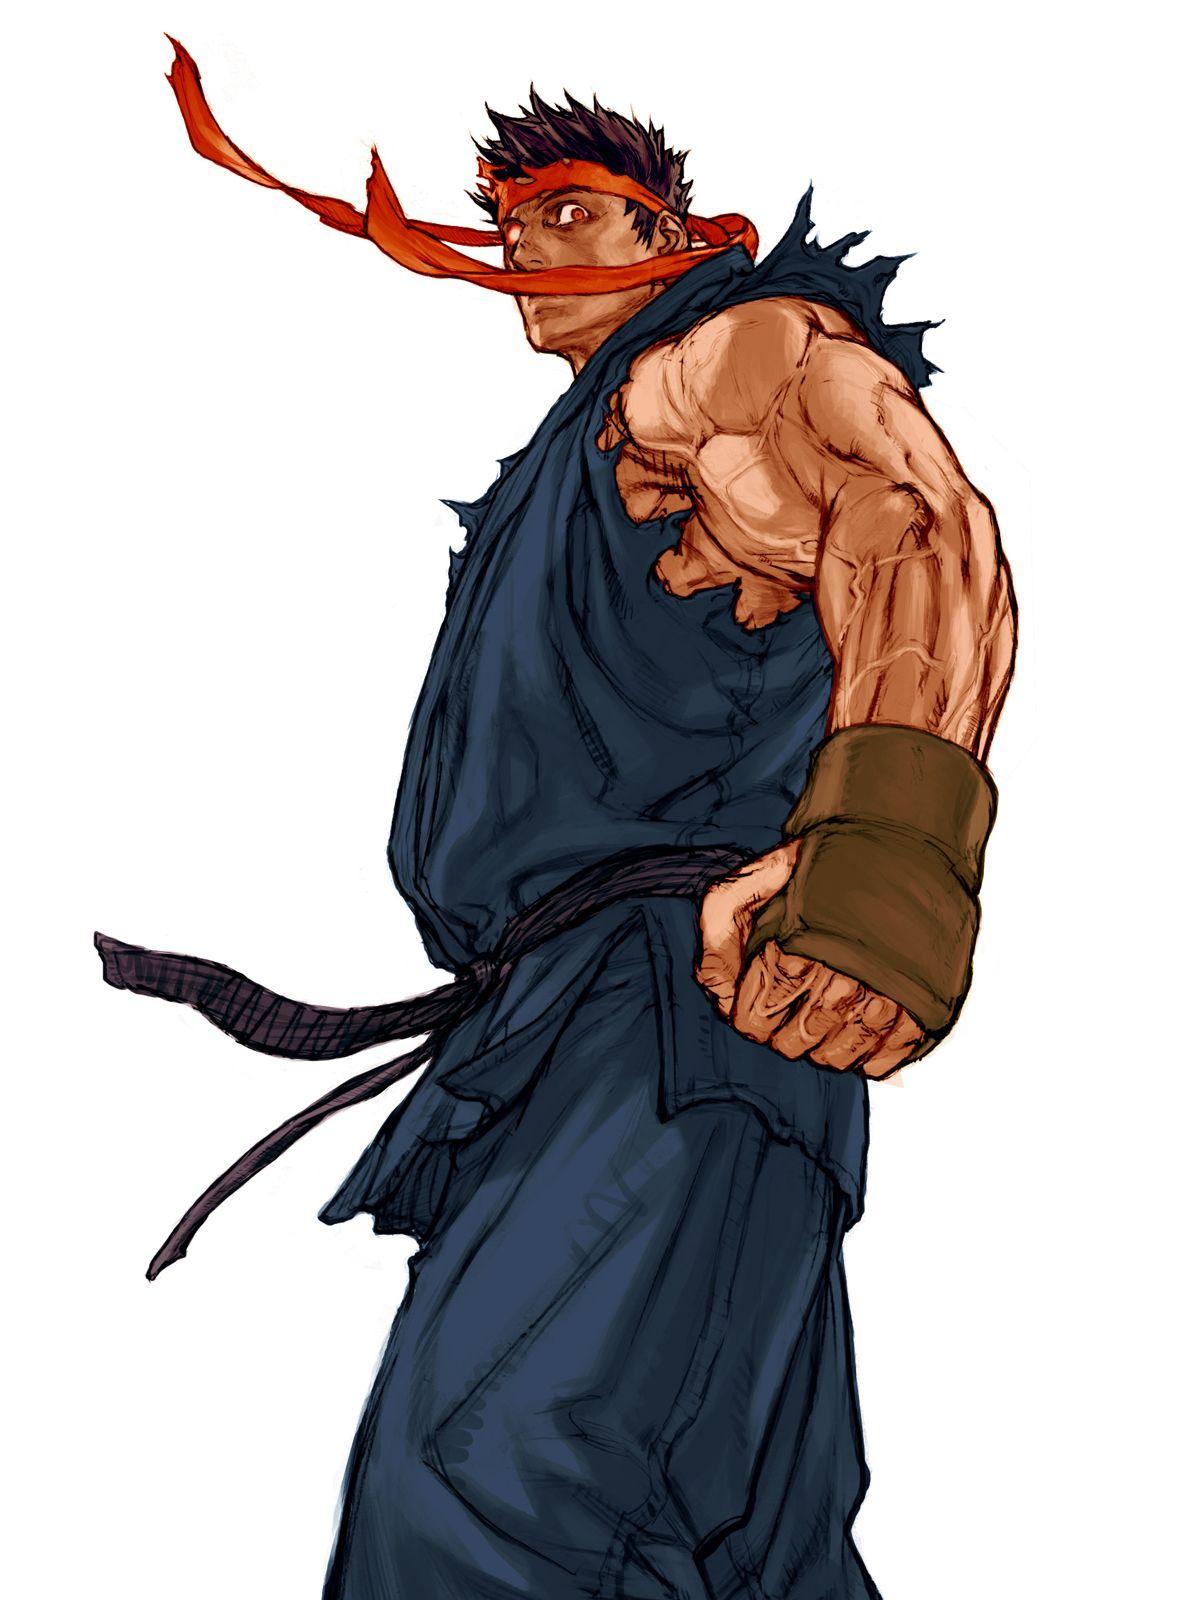 Evil Ryu By Kinu Nishimura Jpg 1200 1600 Street Fighter